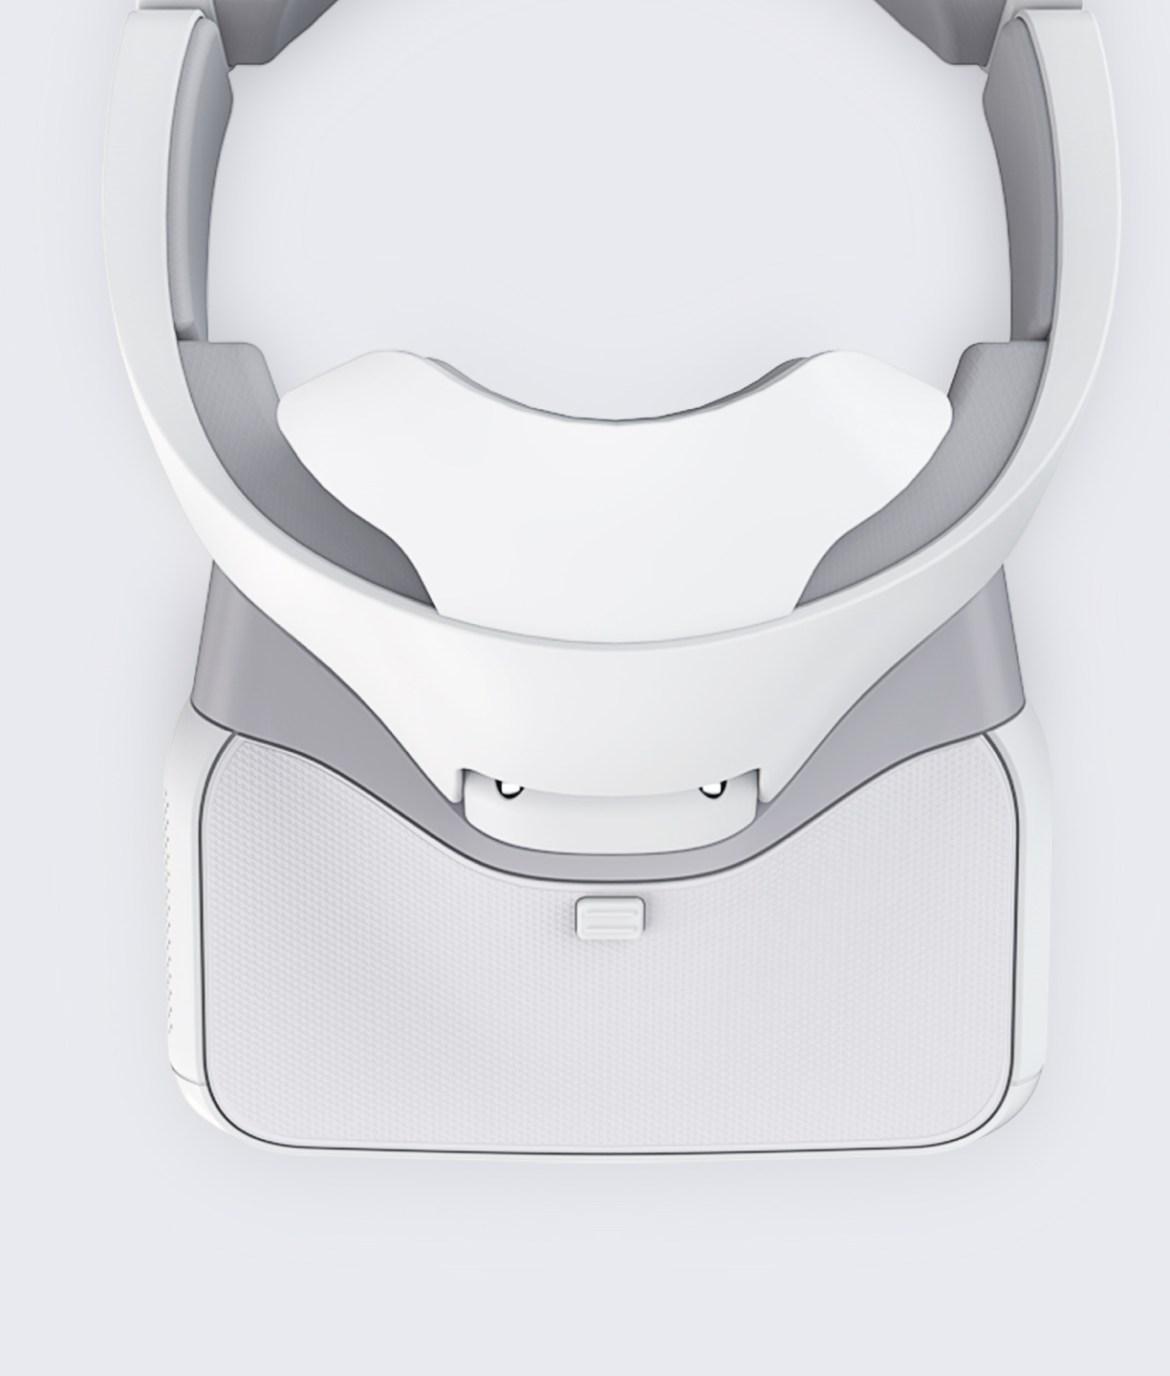 fpvcrazy 3-41eba9aa5d82bc561c925ec52f13fb48 New fpv goggles in market -DJI Goggles!! GUIDE TO BUY DRONE  fpv goggles dji googles